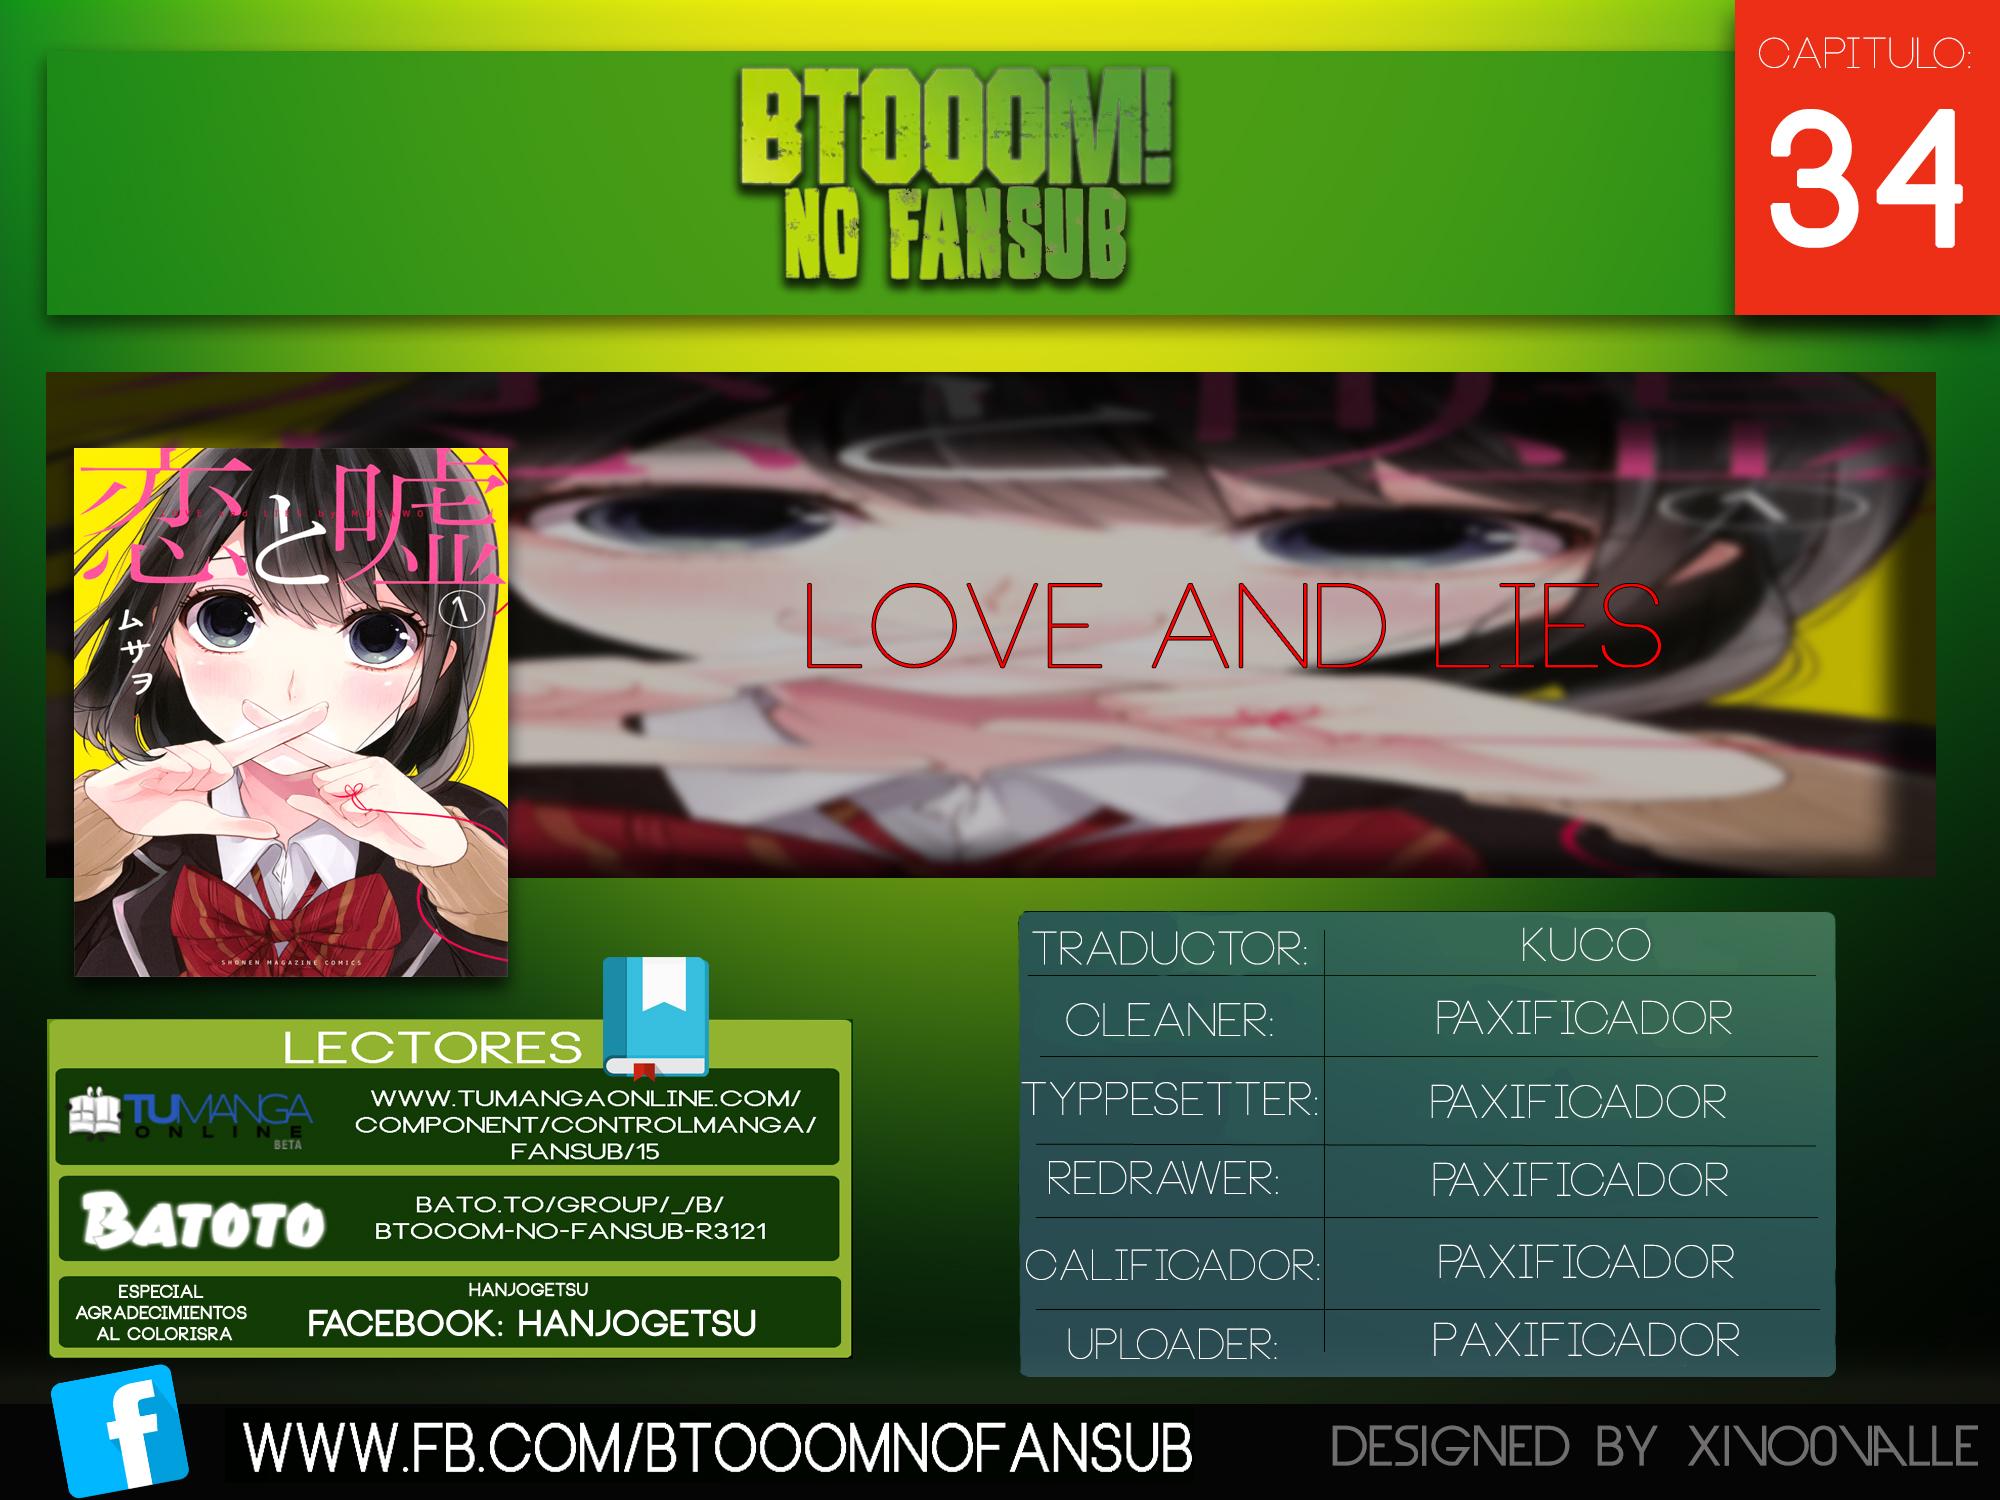 https://c5.ninemanga.com/es_manga/14/14734/361015/c4536001673379765300886594b6b485.jpg Page 1